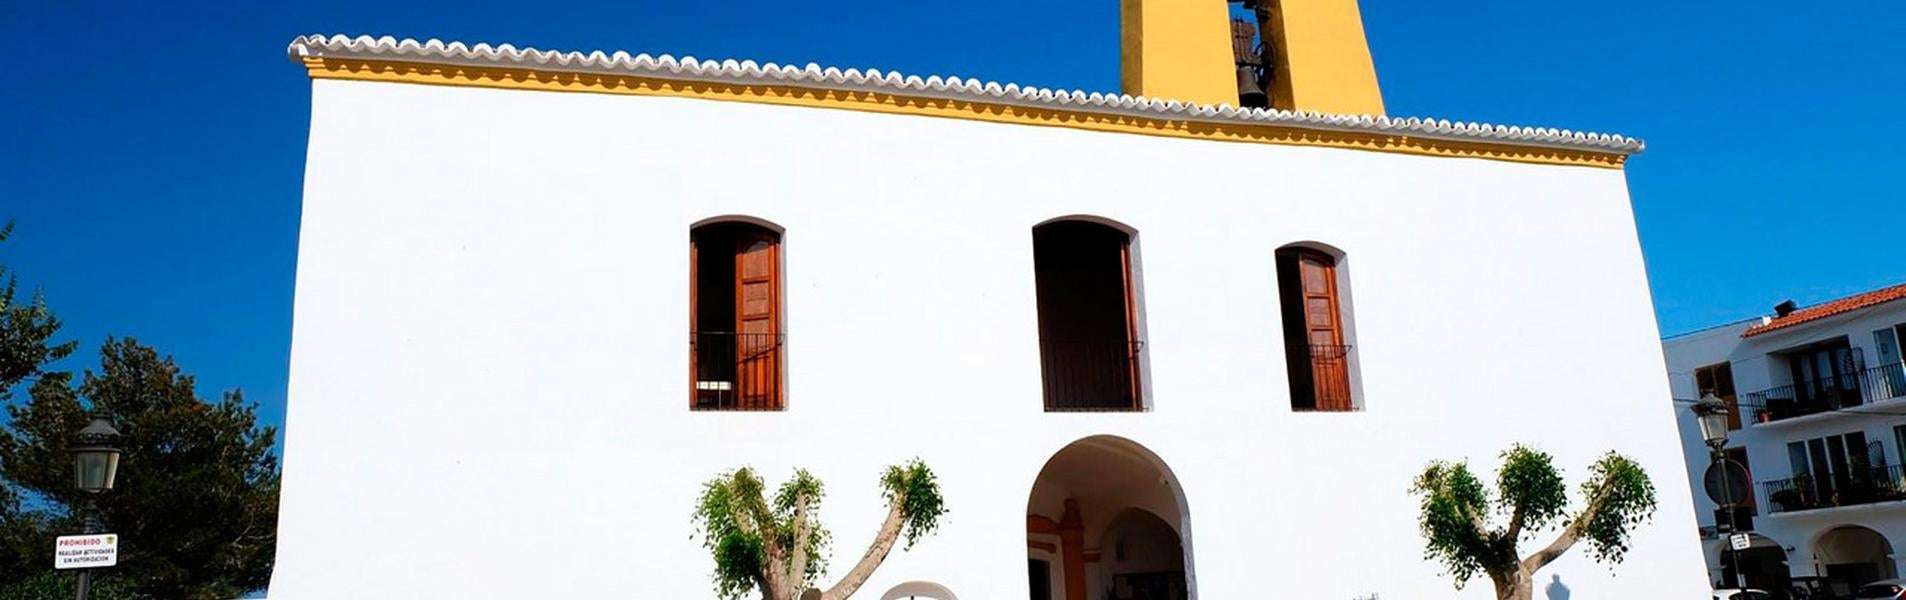 Santa Gertrudis de Fruitera